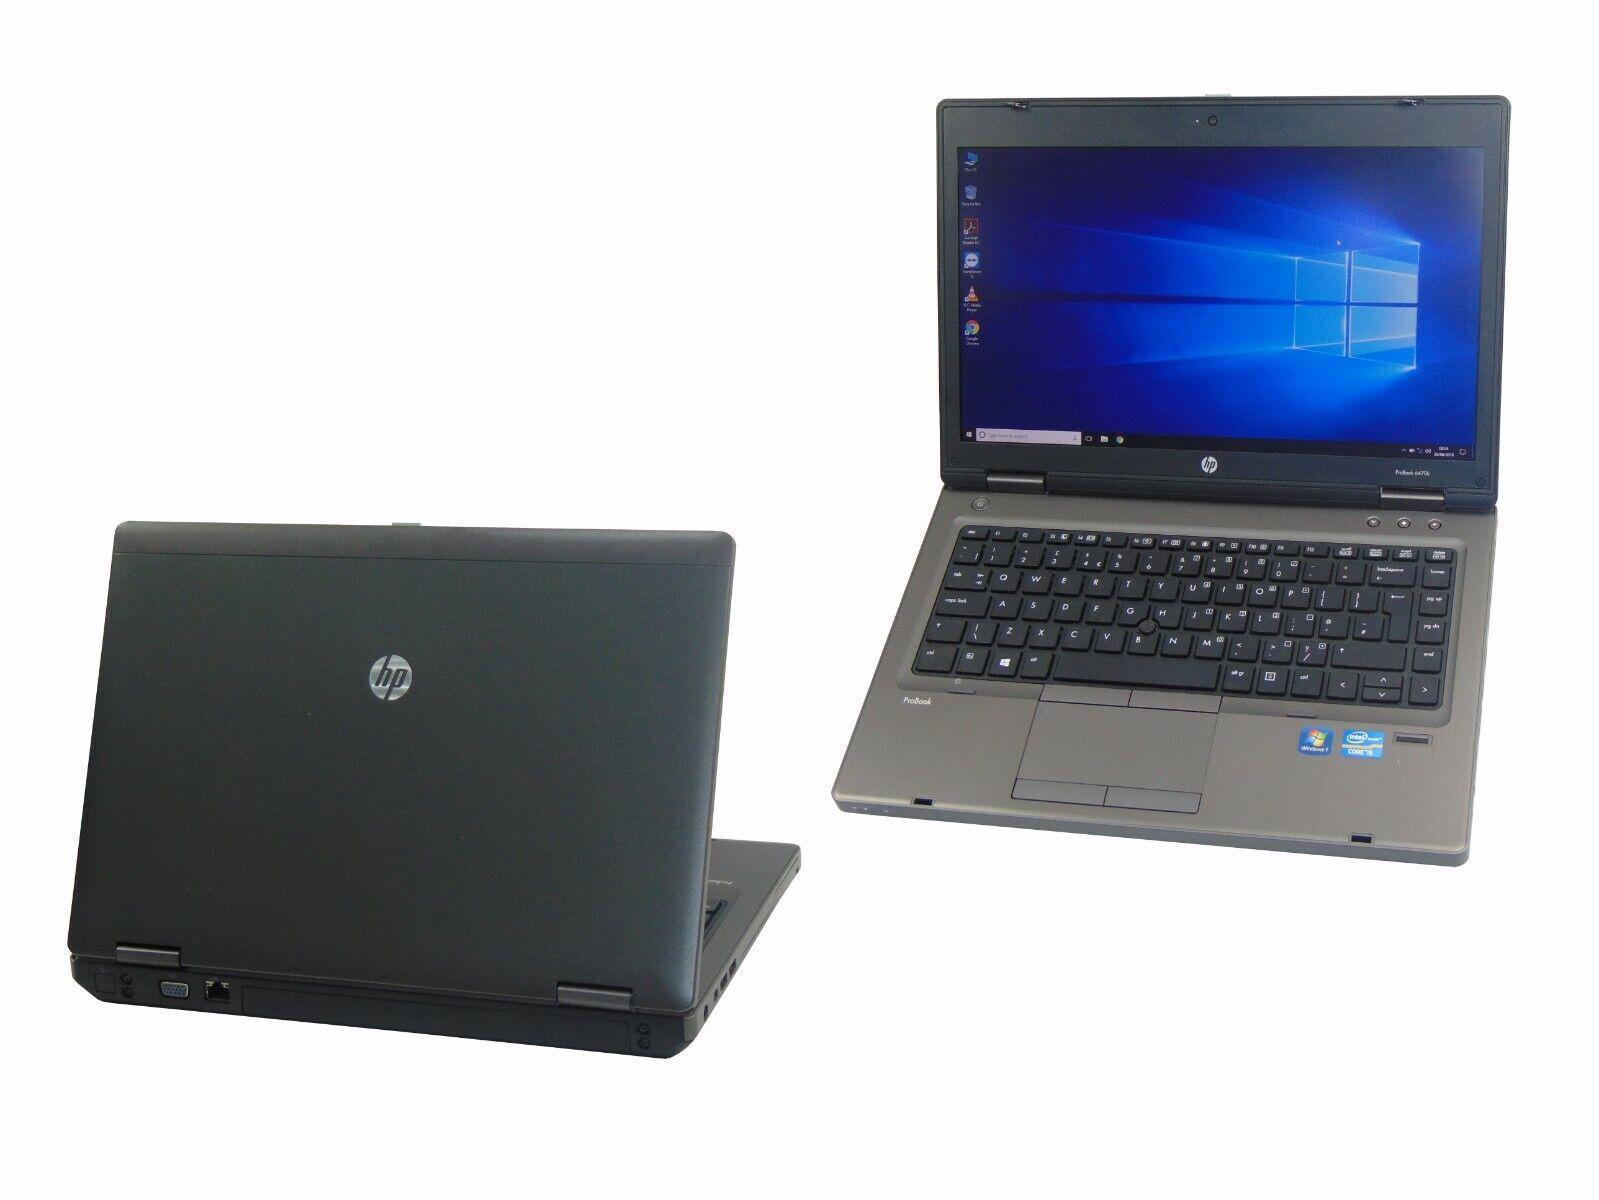 Laptop Windows - HP Laptop Windows 10 ProBook 6460b Core i5-2520M 2.5Hz 4GB 500GB Warranty